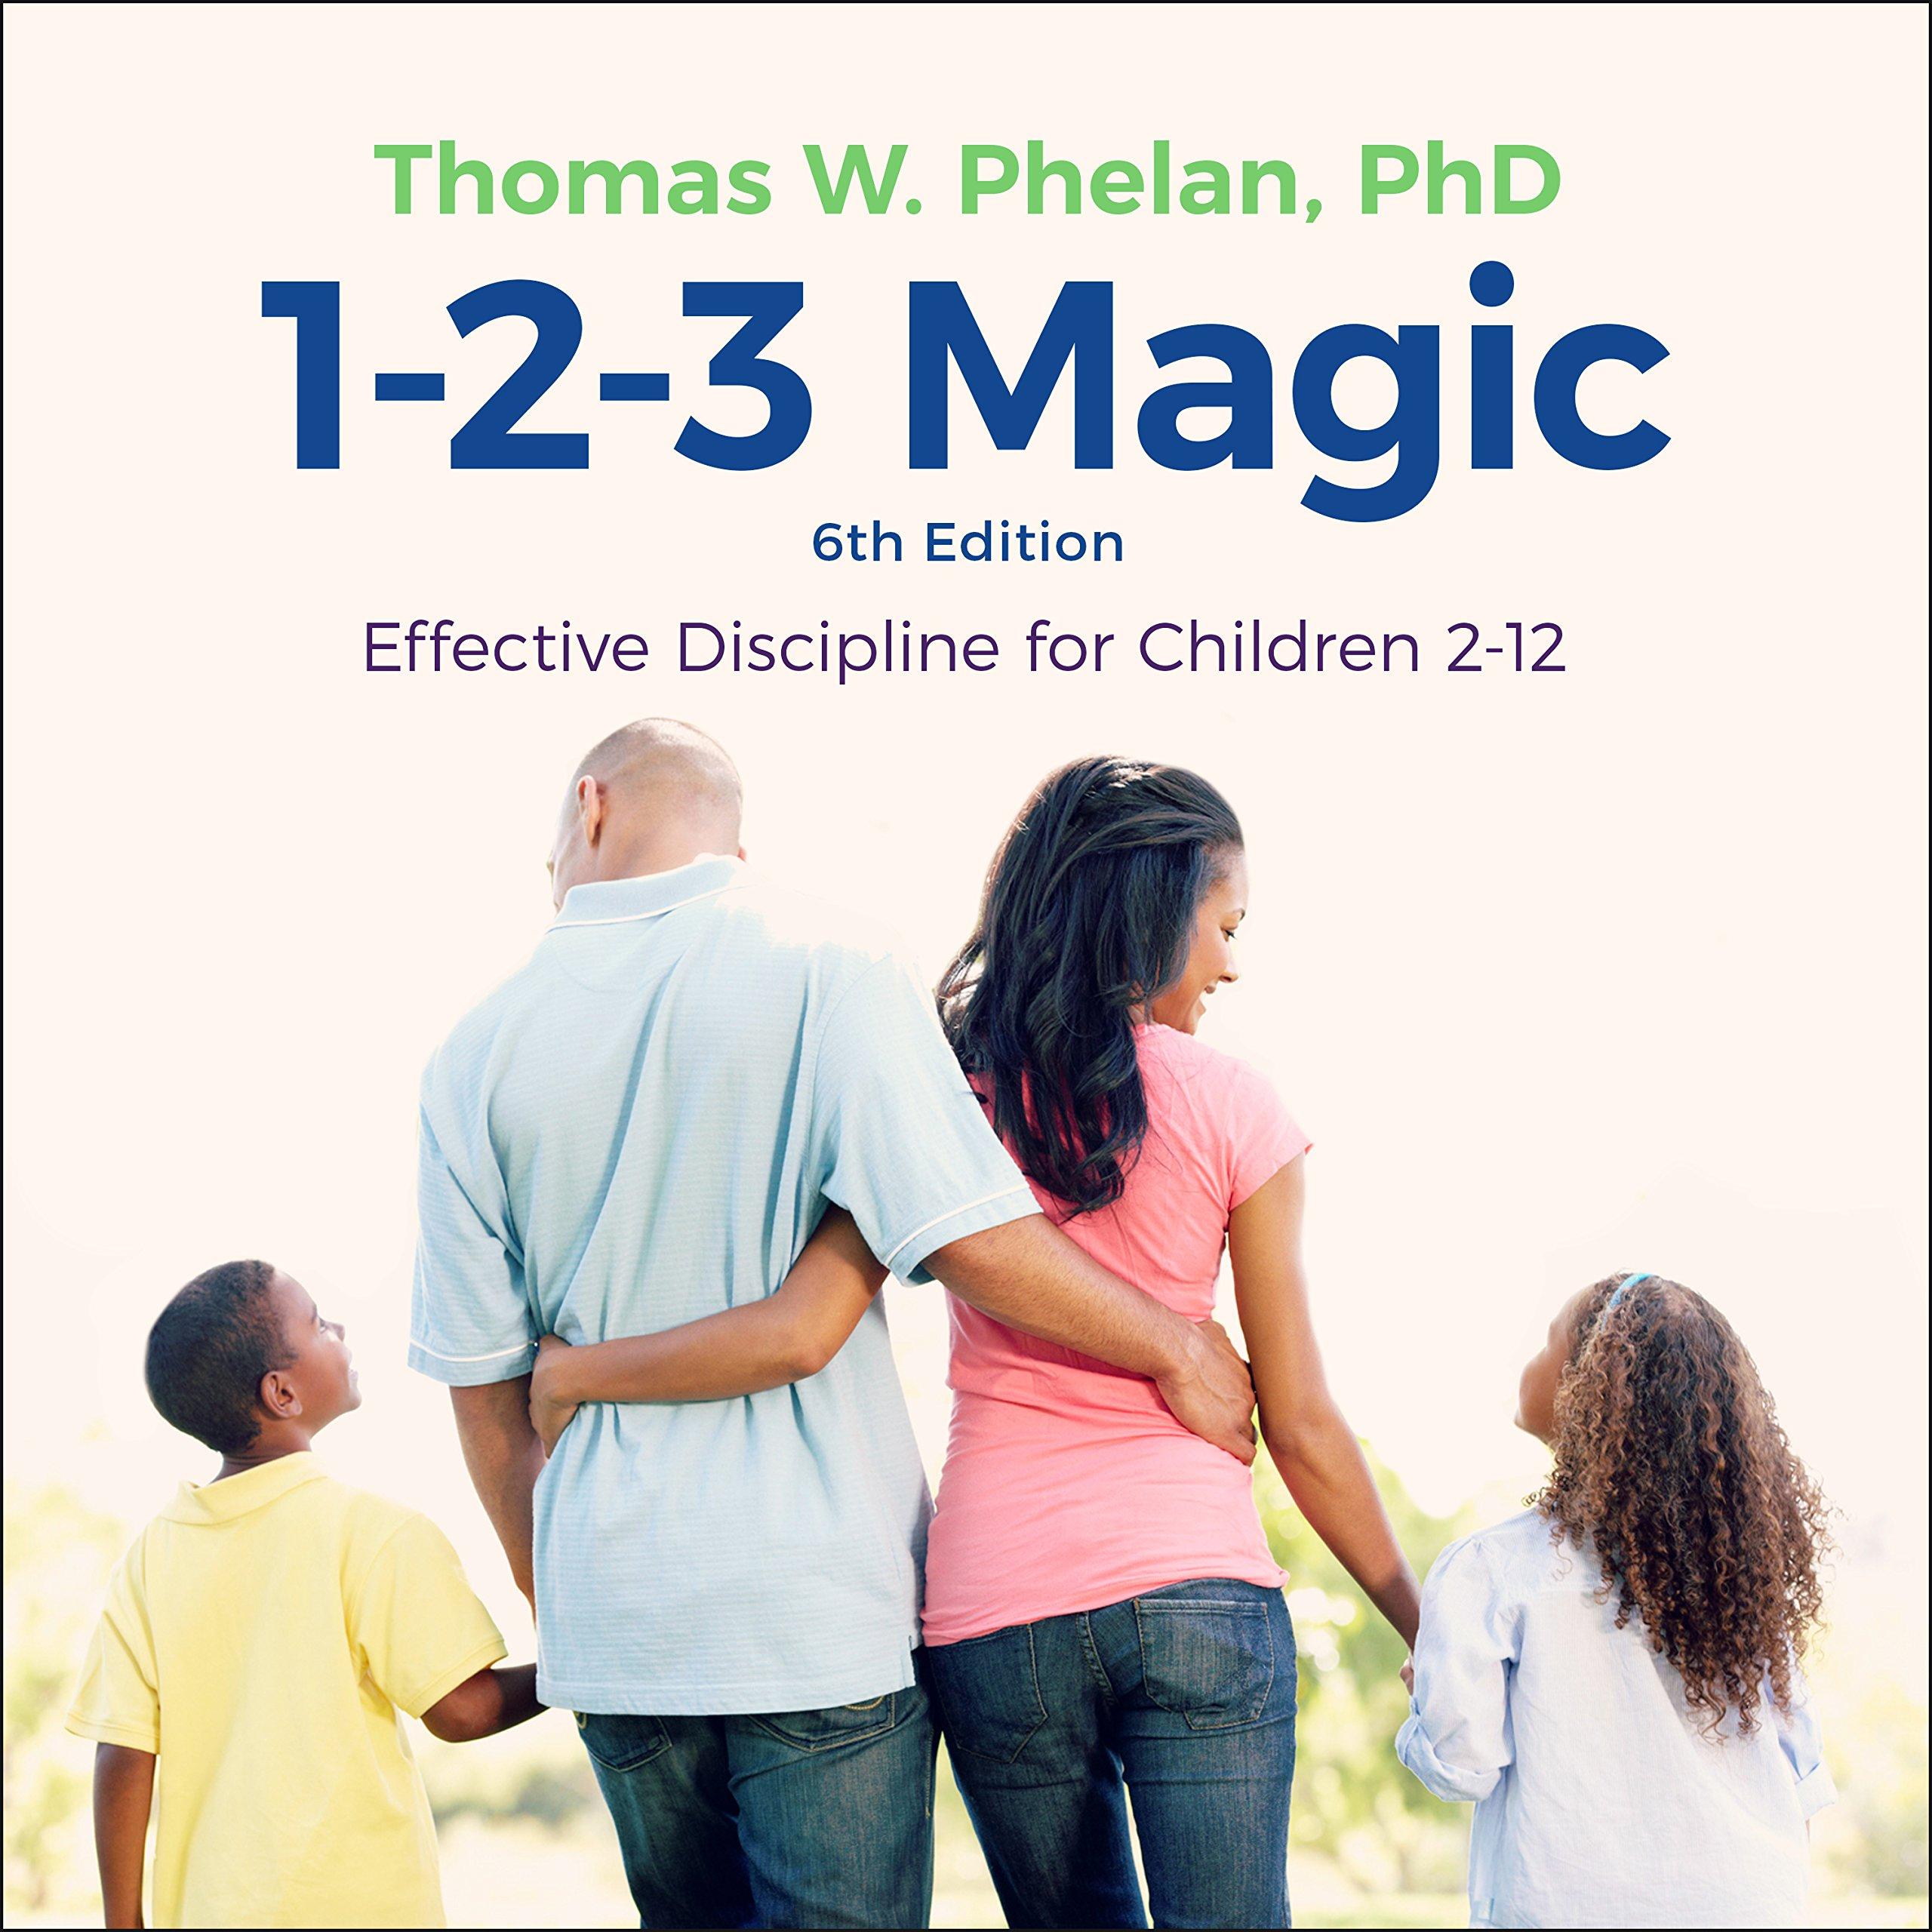 1-2-3 Magic: Effective Discipline for Children 2-12 (6th edition)